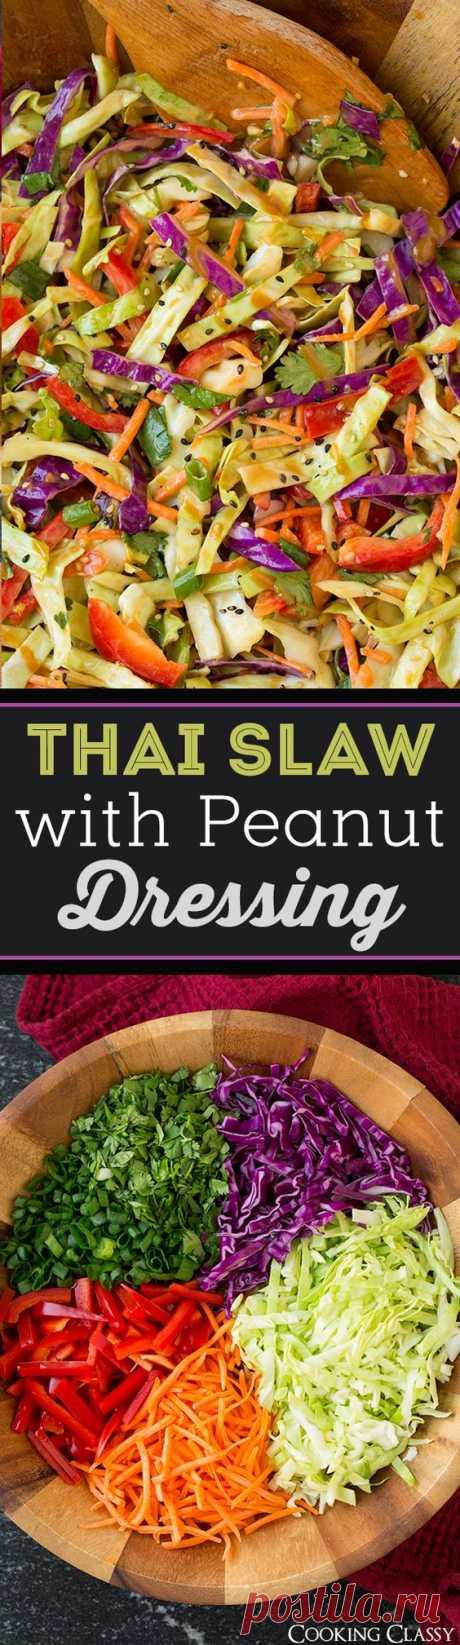 (59) Thai Slaw with Peanut Dressing | Рецепт